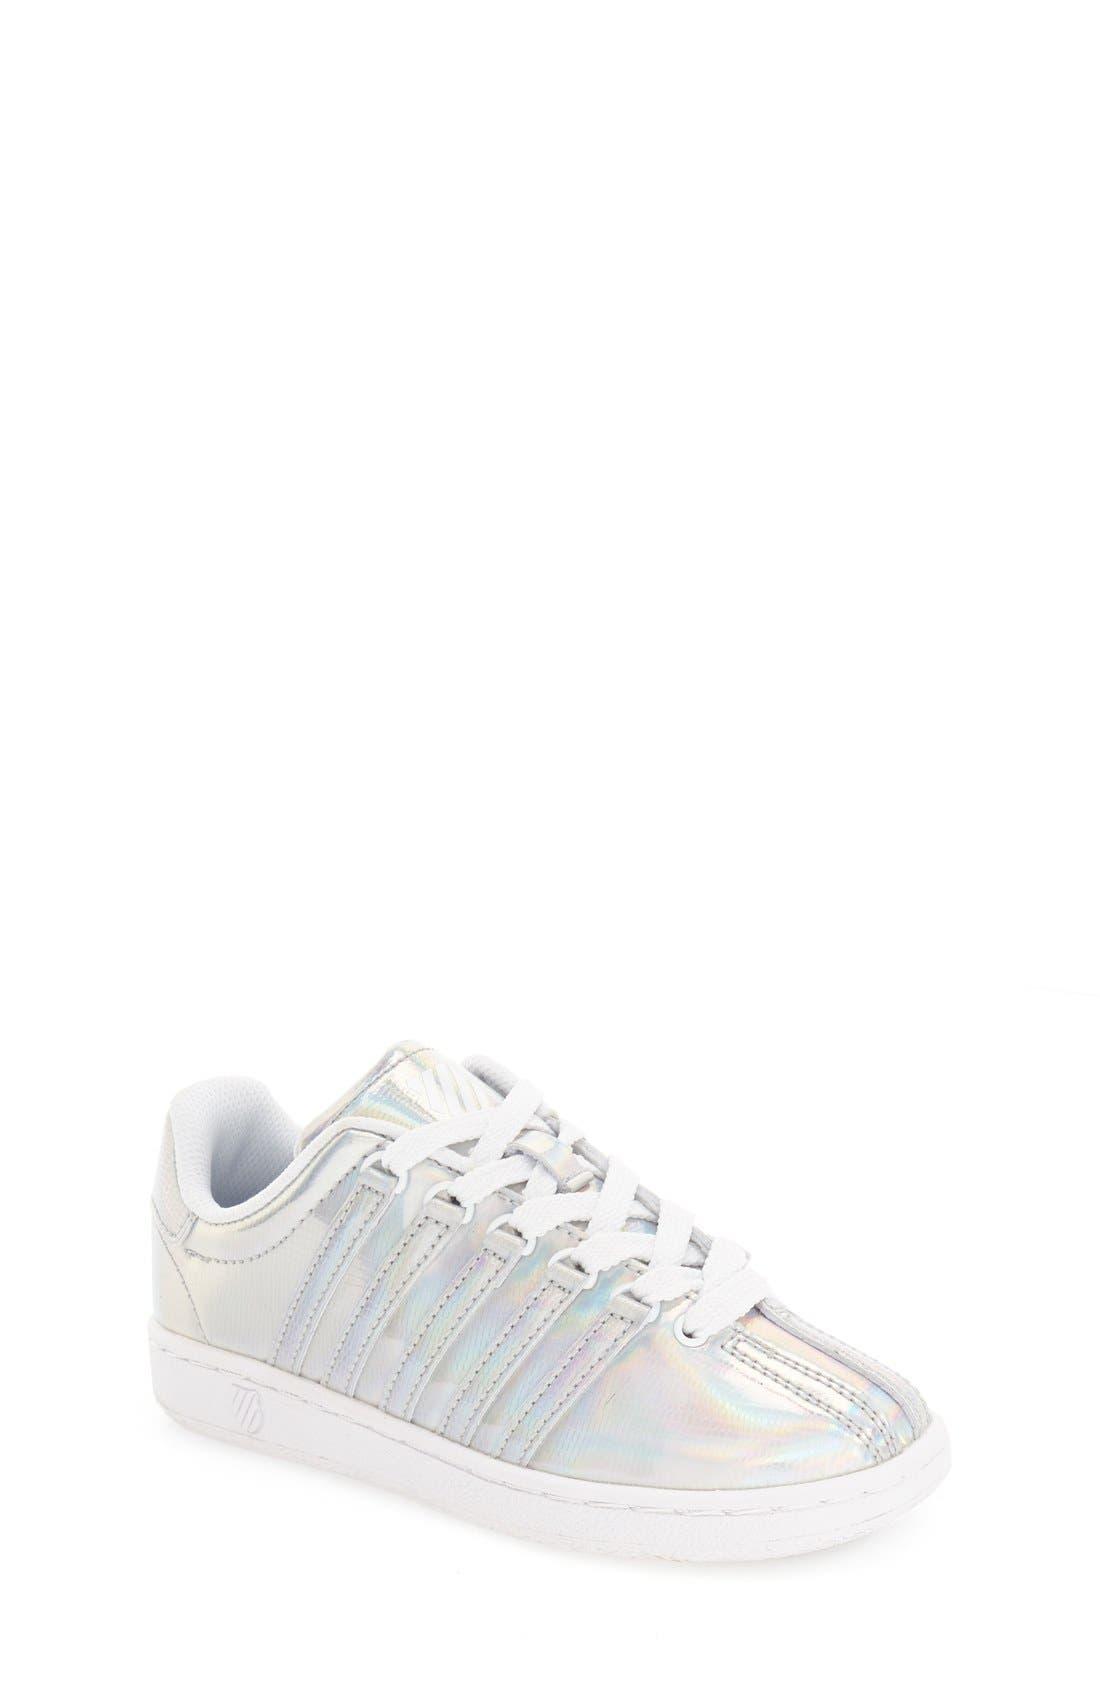 'Classic - Shine On' Sneaker,                             Main thumbnail 1, color,                             086